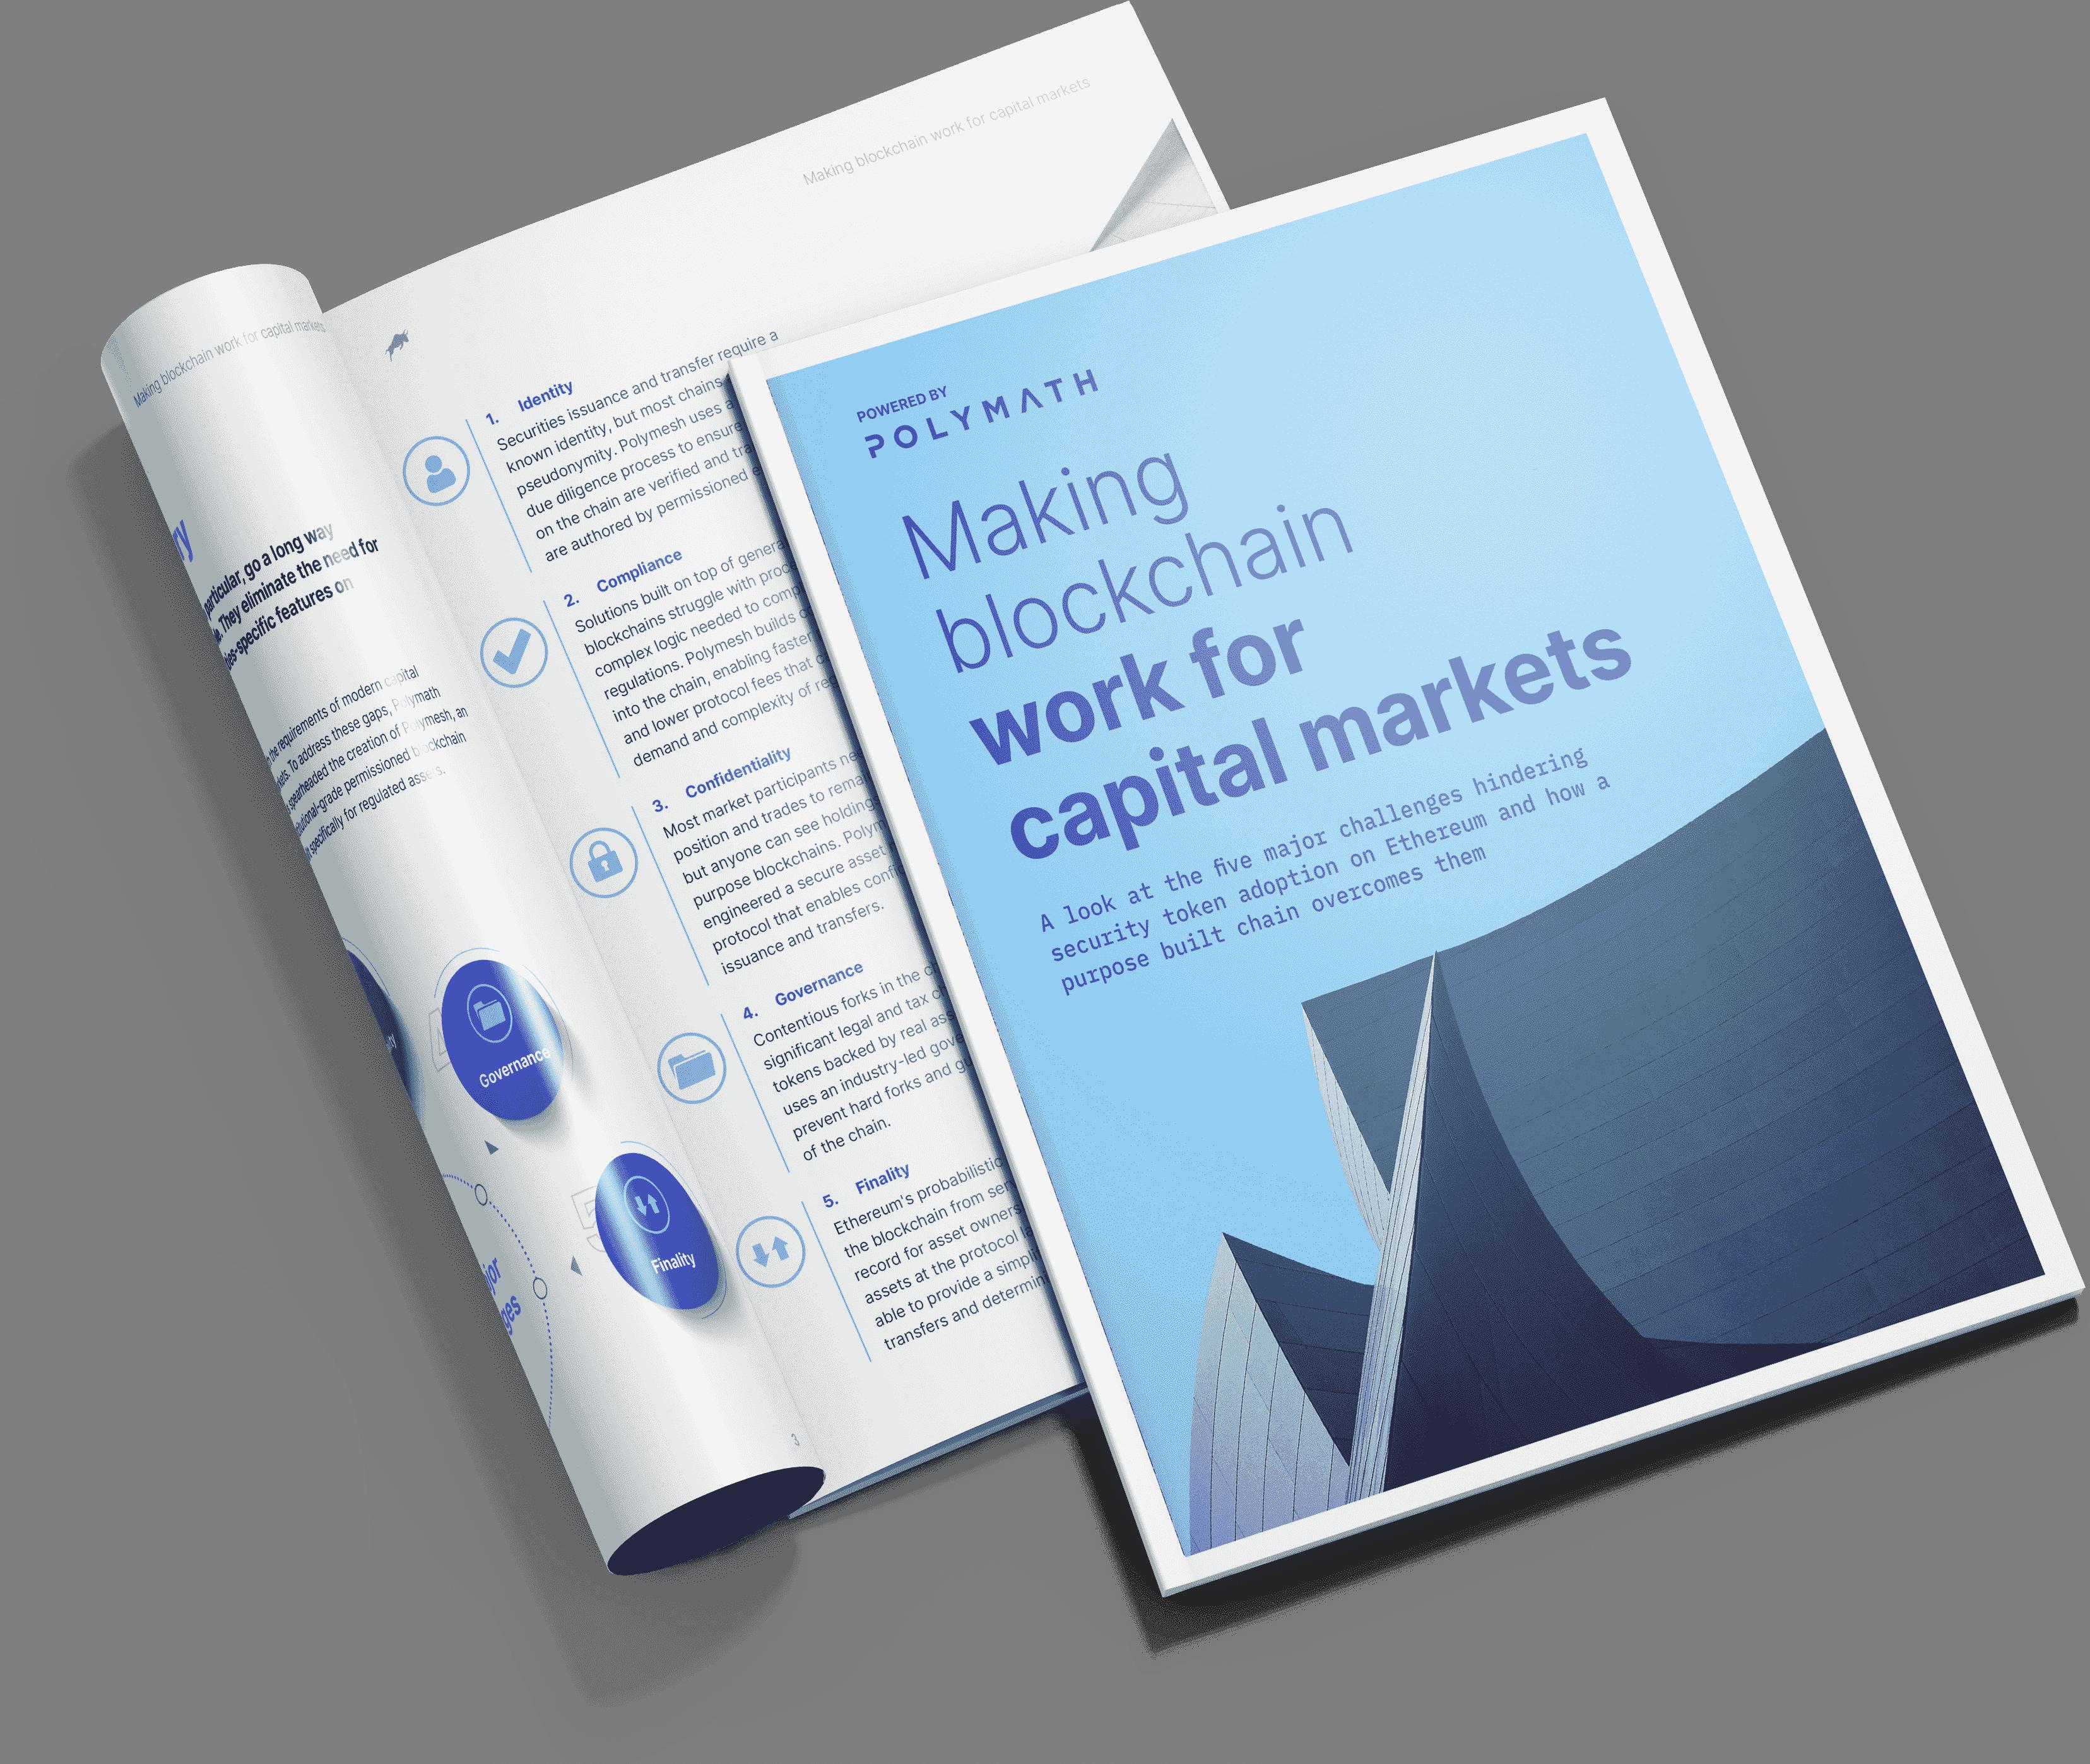 Making Blockchain Work for Capital Markets